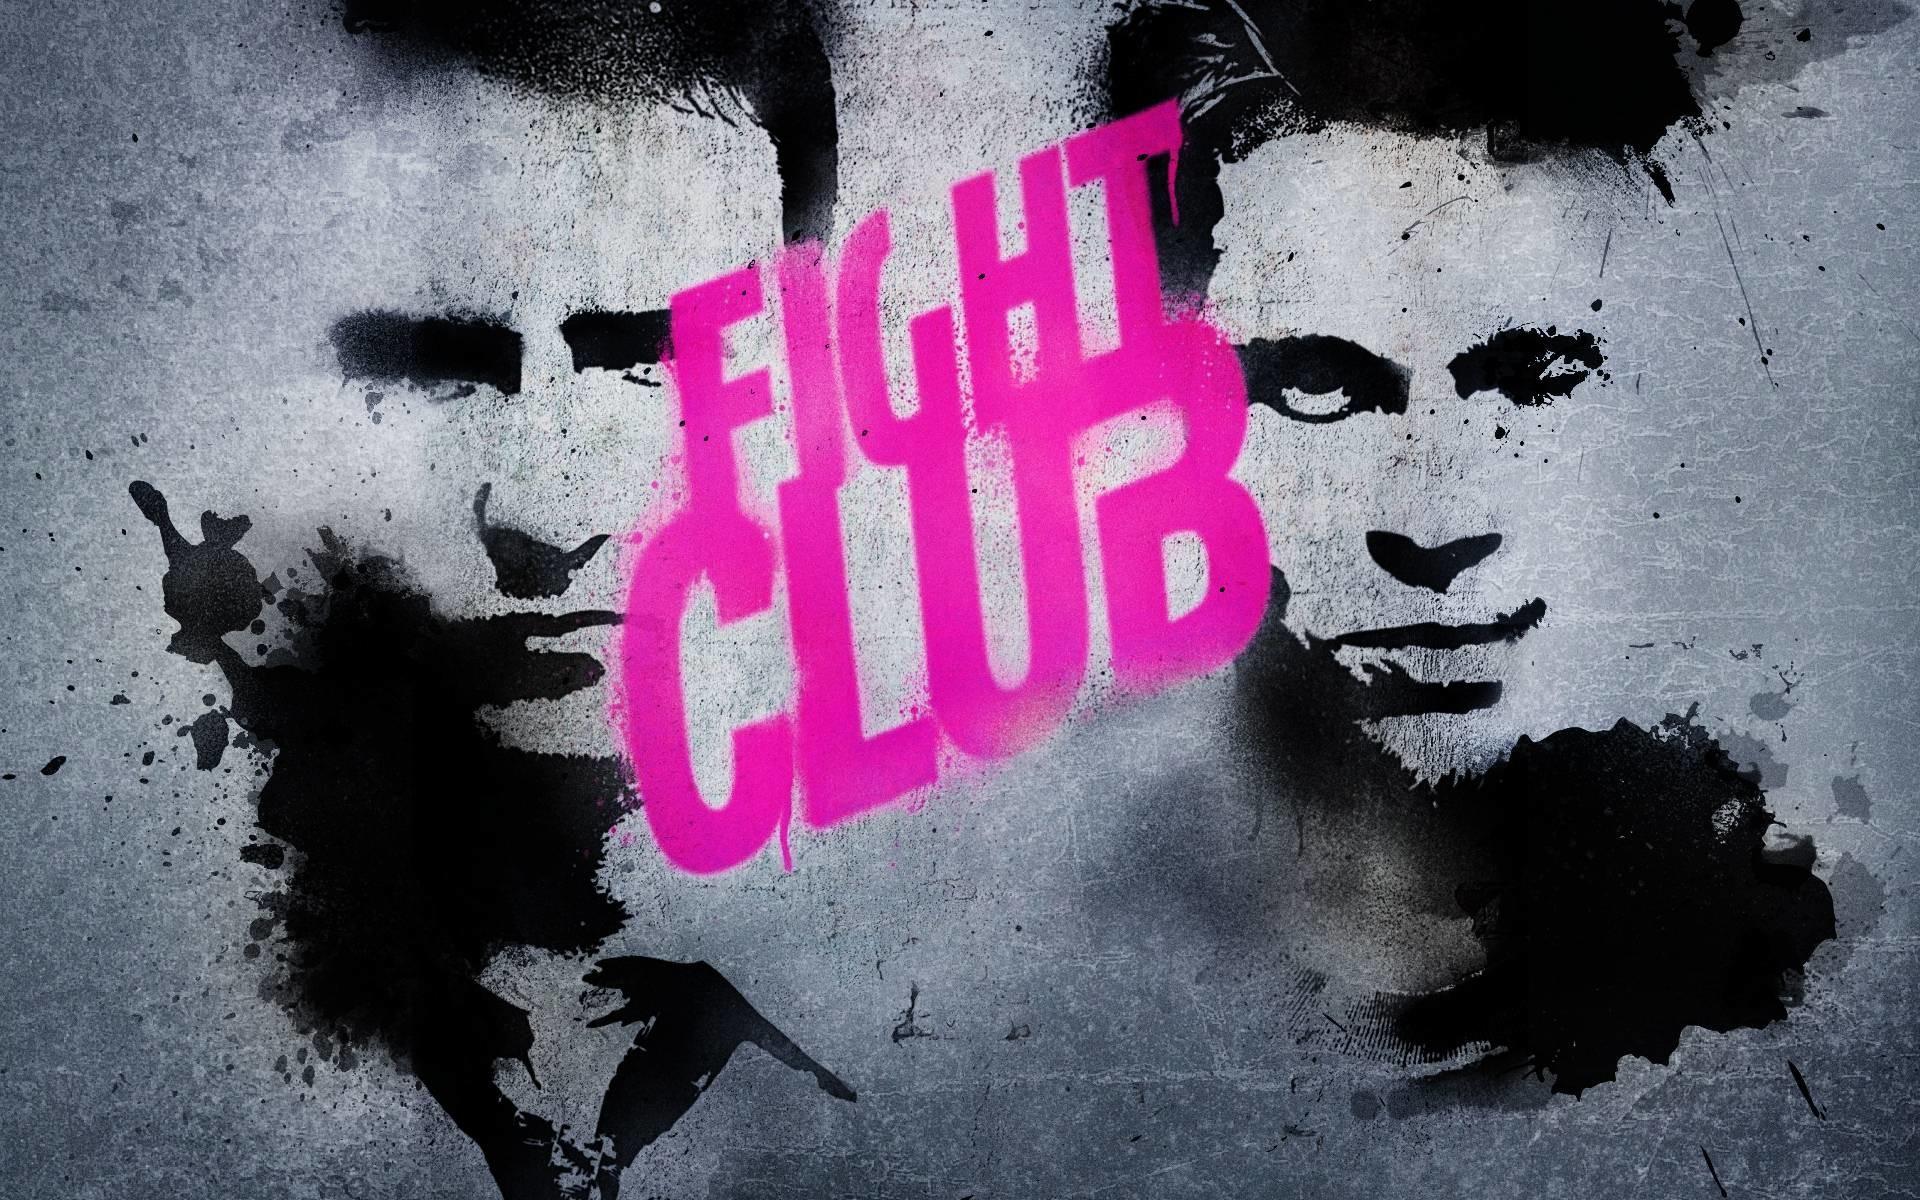 Fight Club Movie Wallpaper Wallpapertag